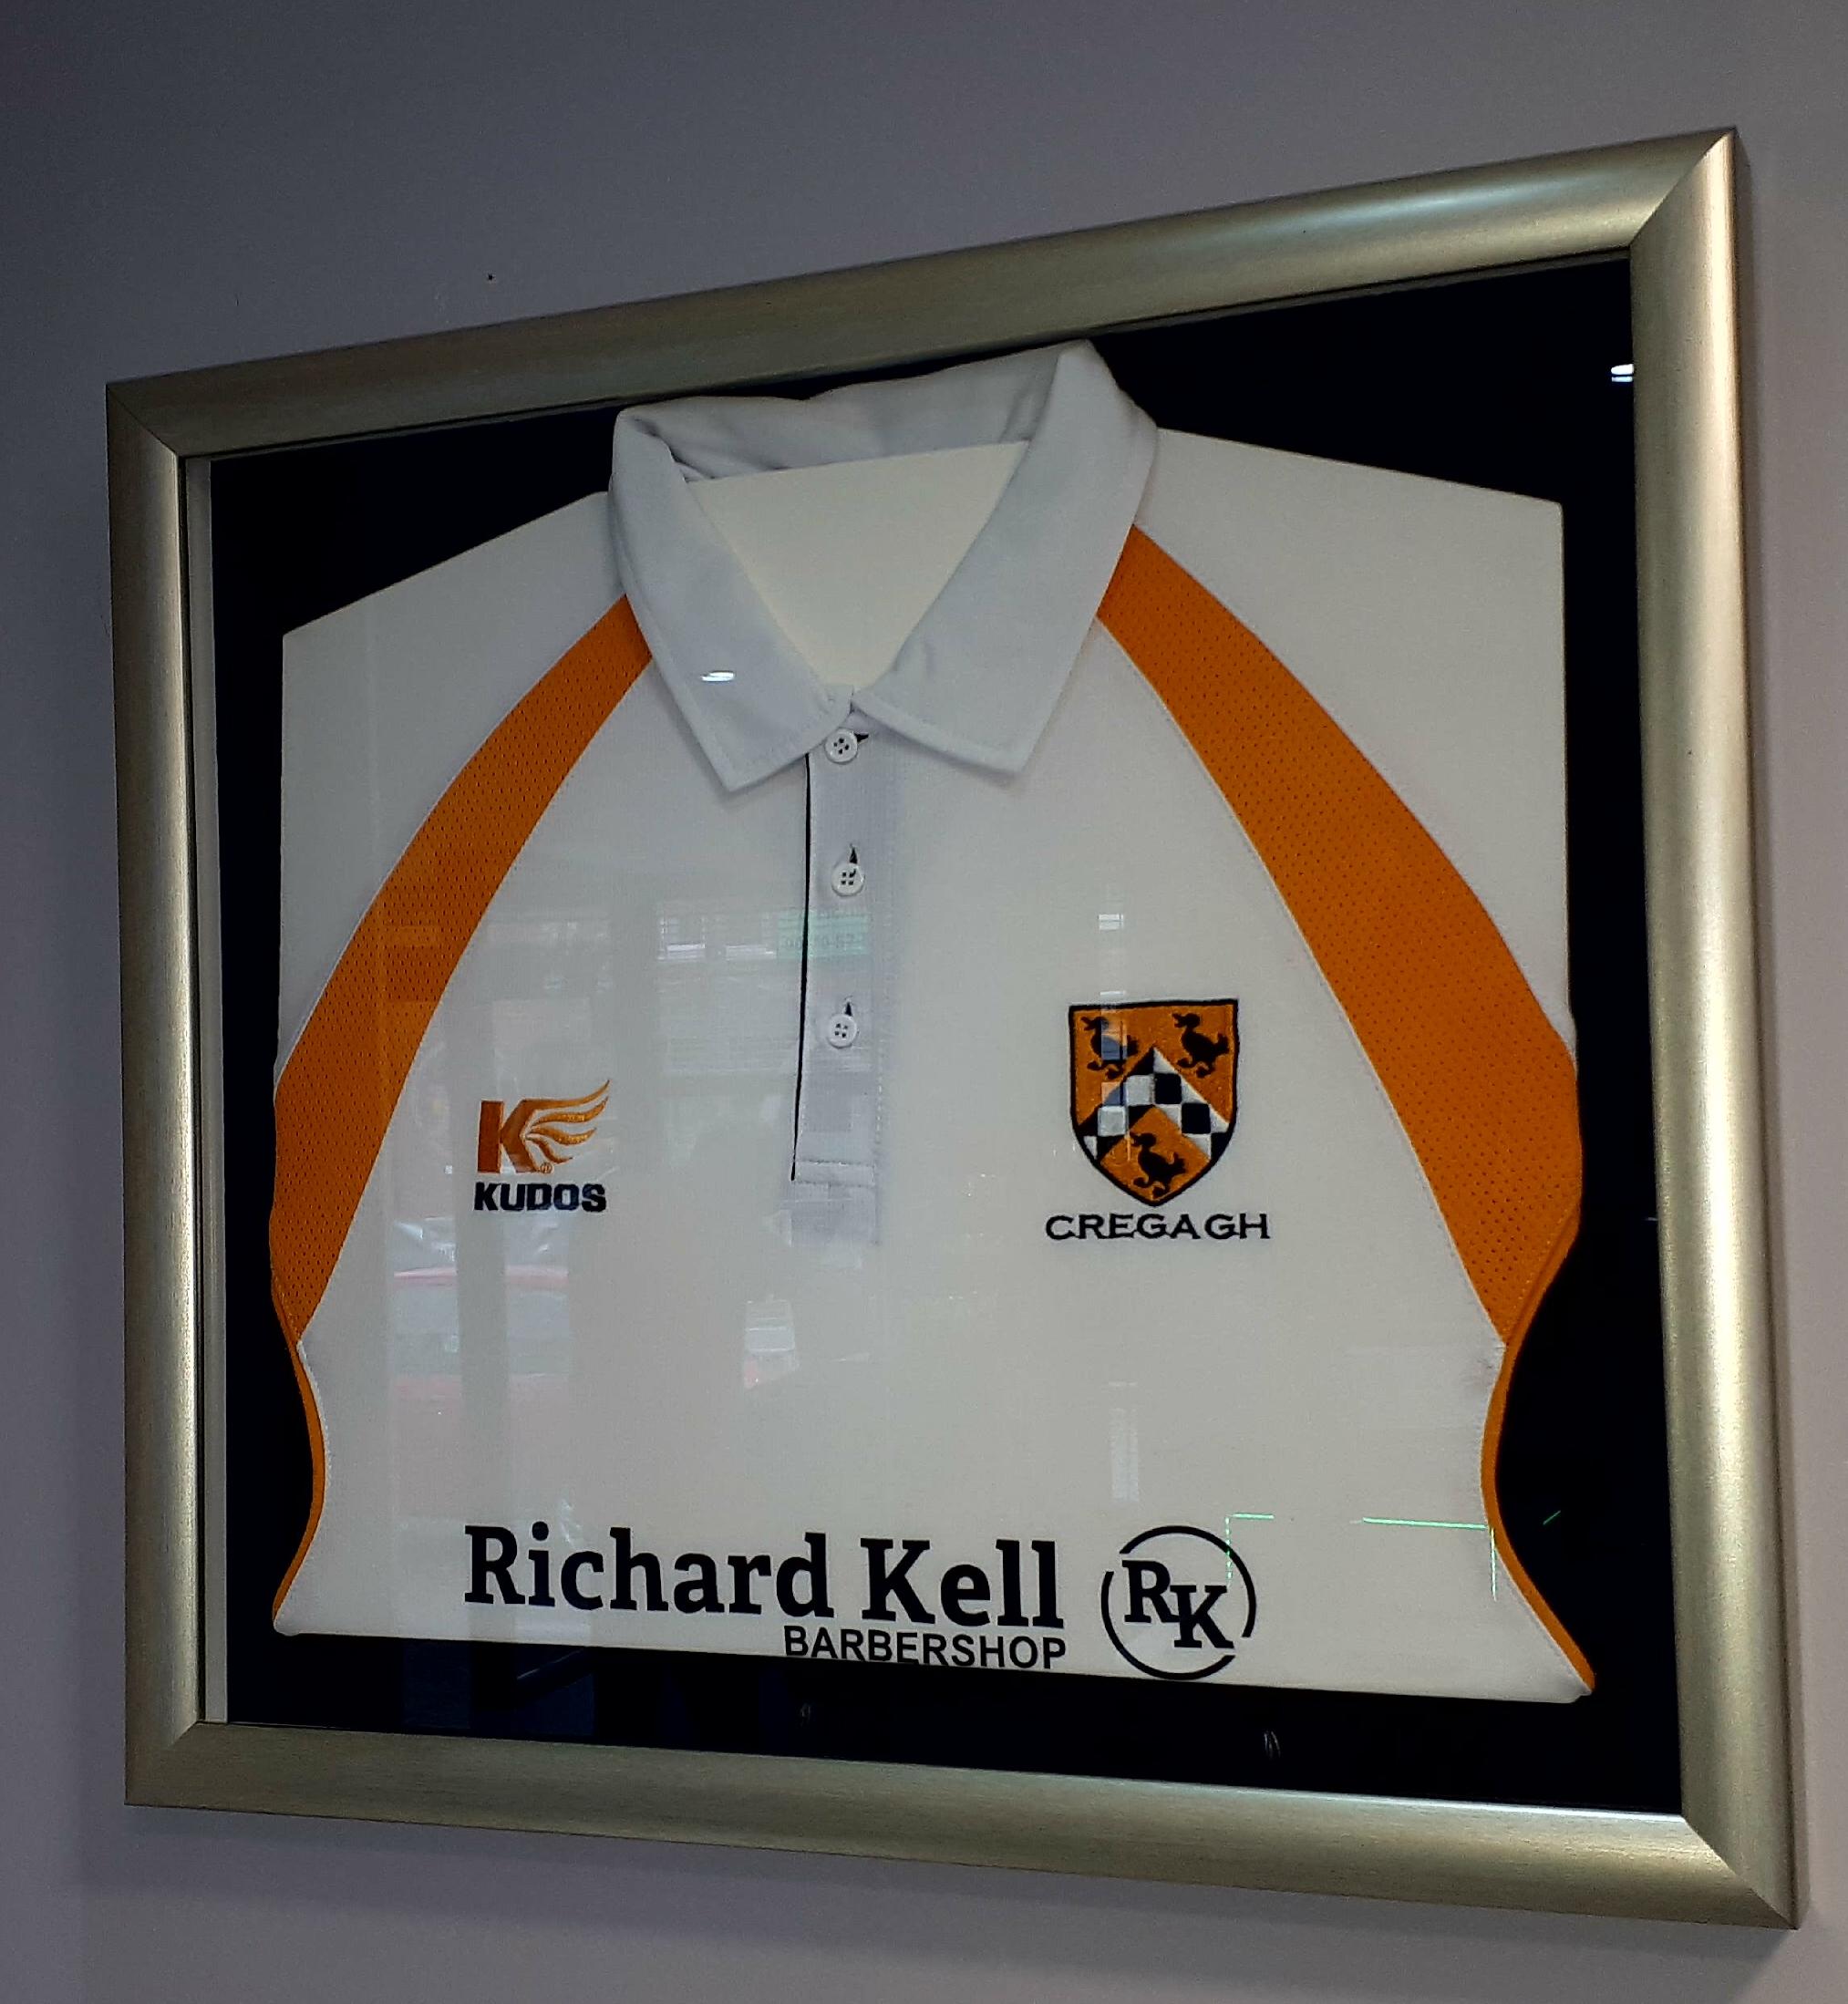 Richard Kell barber shop